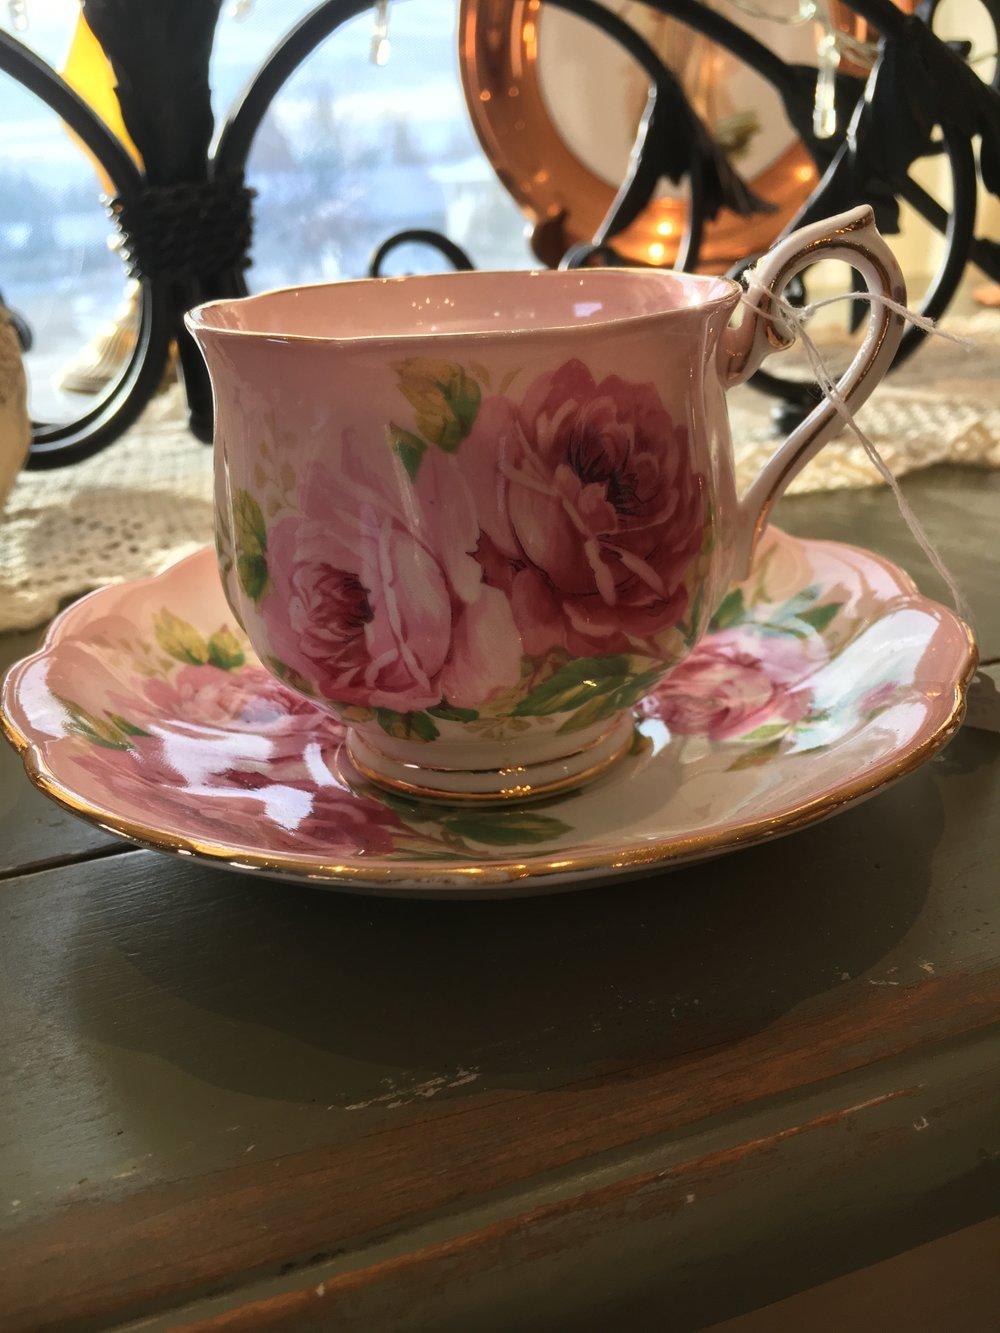 All sorts of beautiful vintage dinnerware